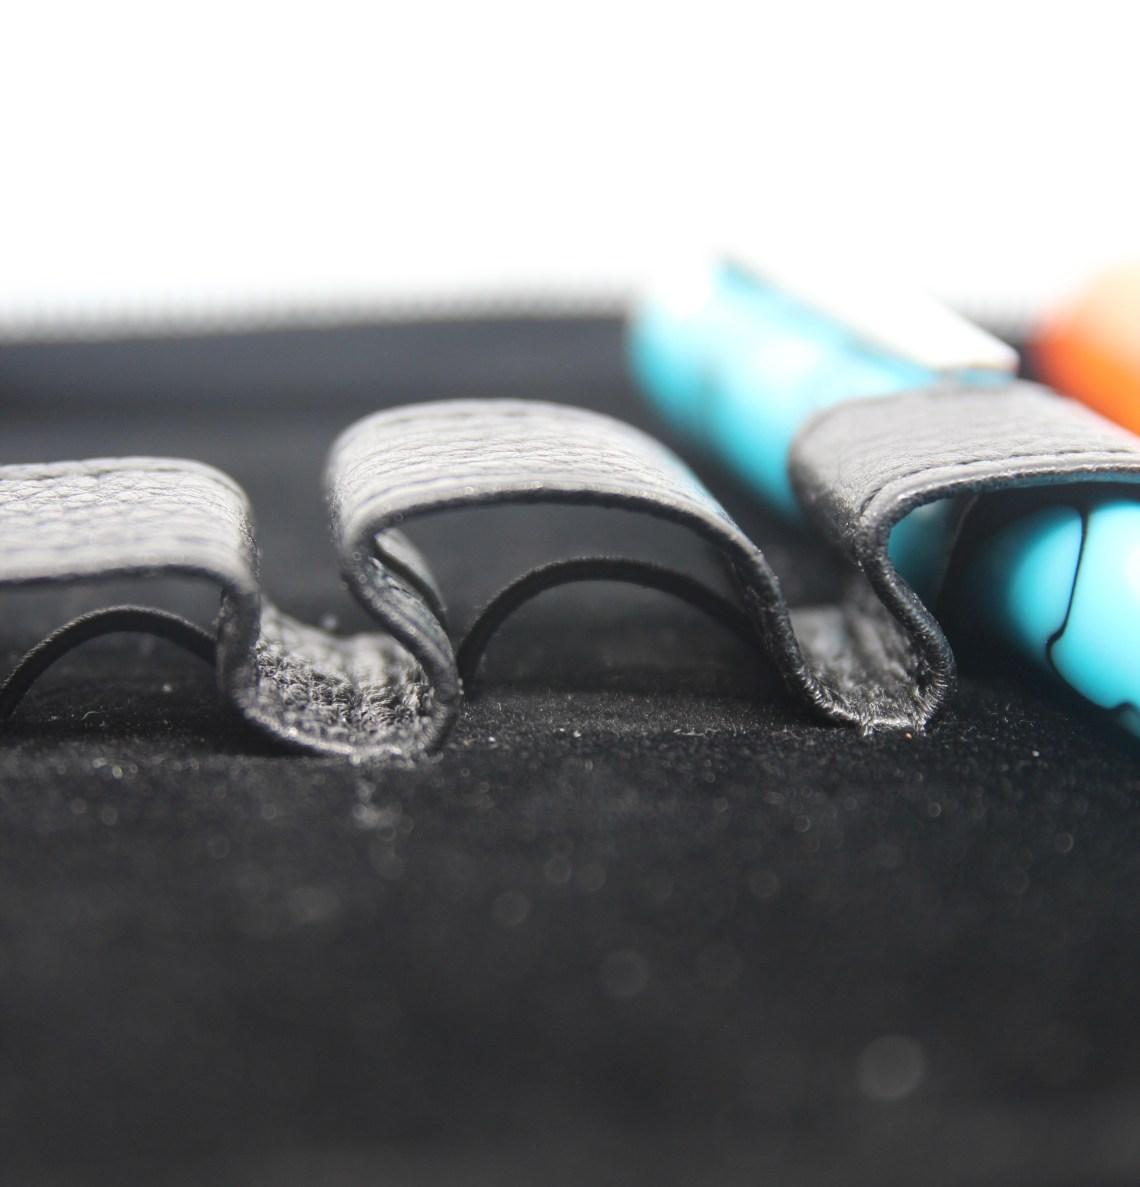 Yak 24 pen case